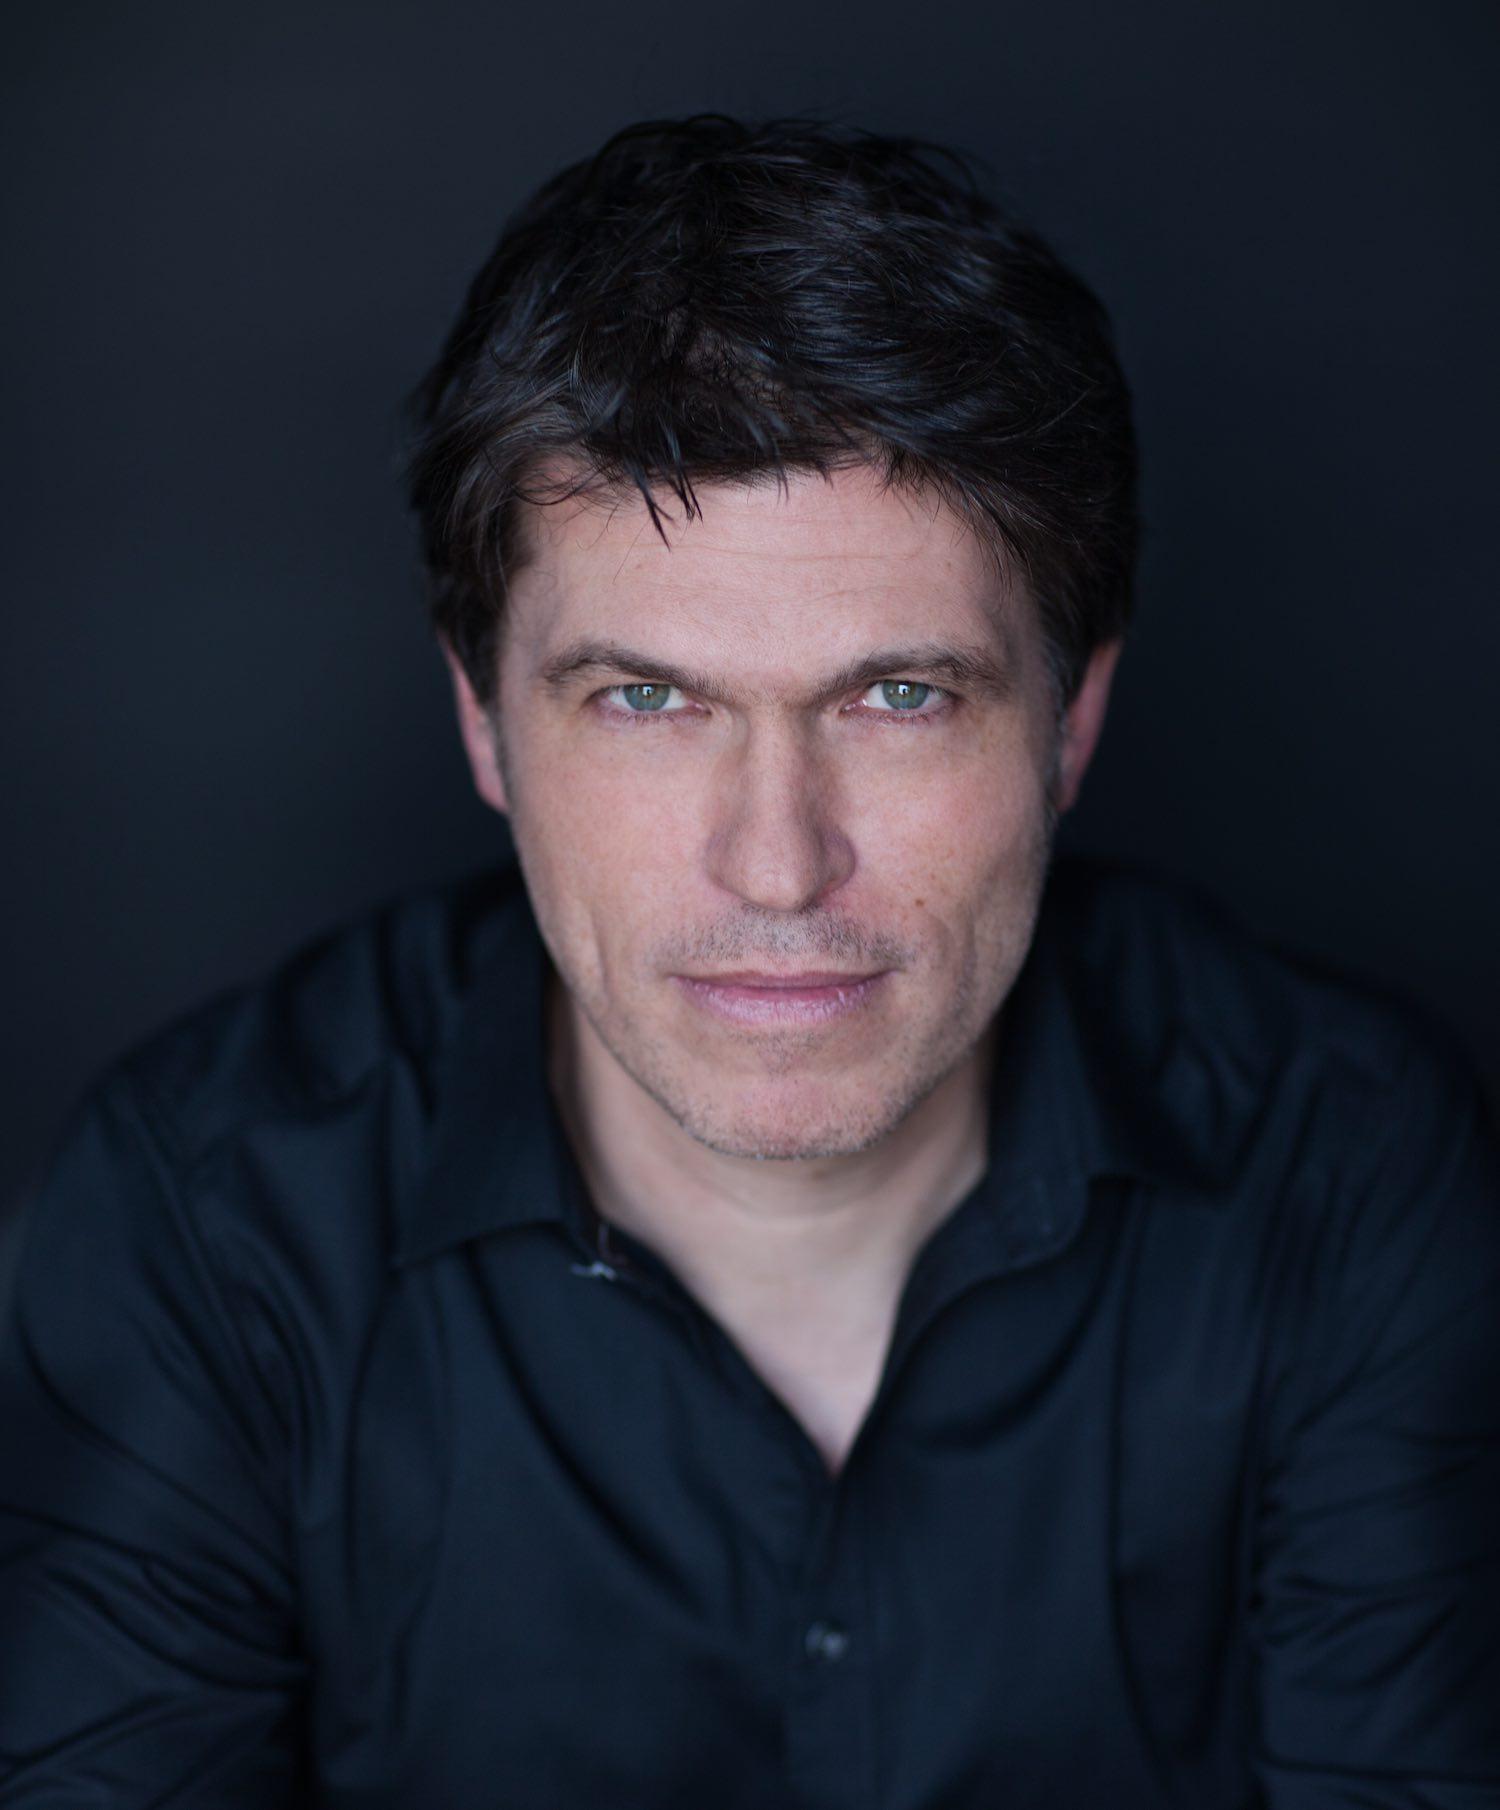 Micheel Nwaisser Director Berlin Portrait